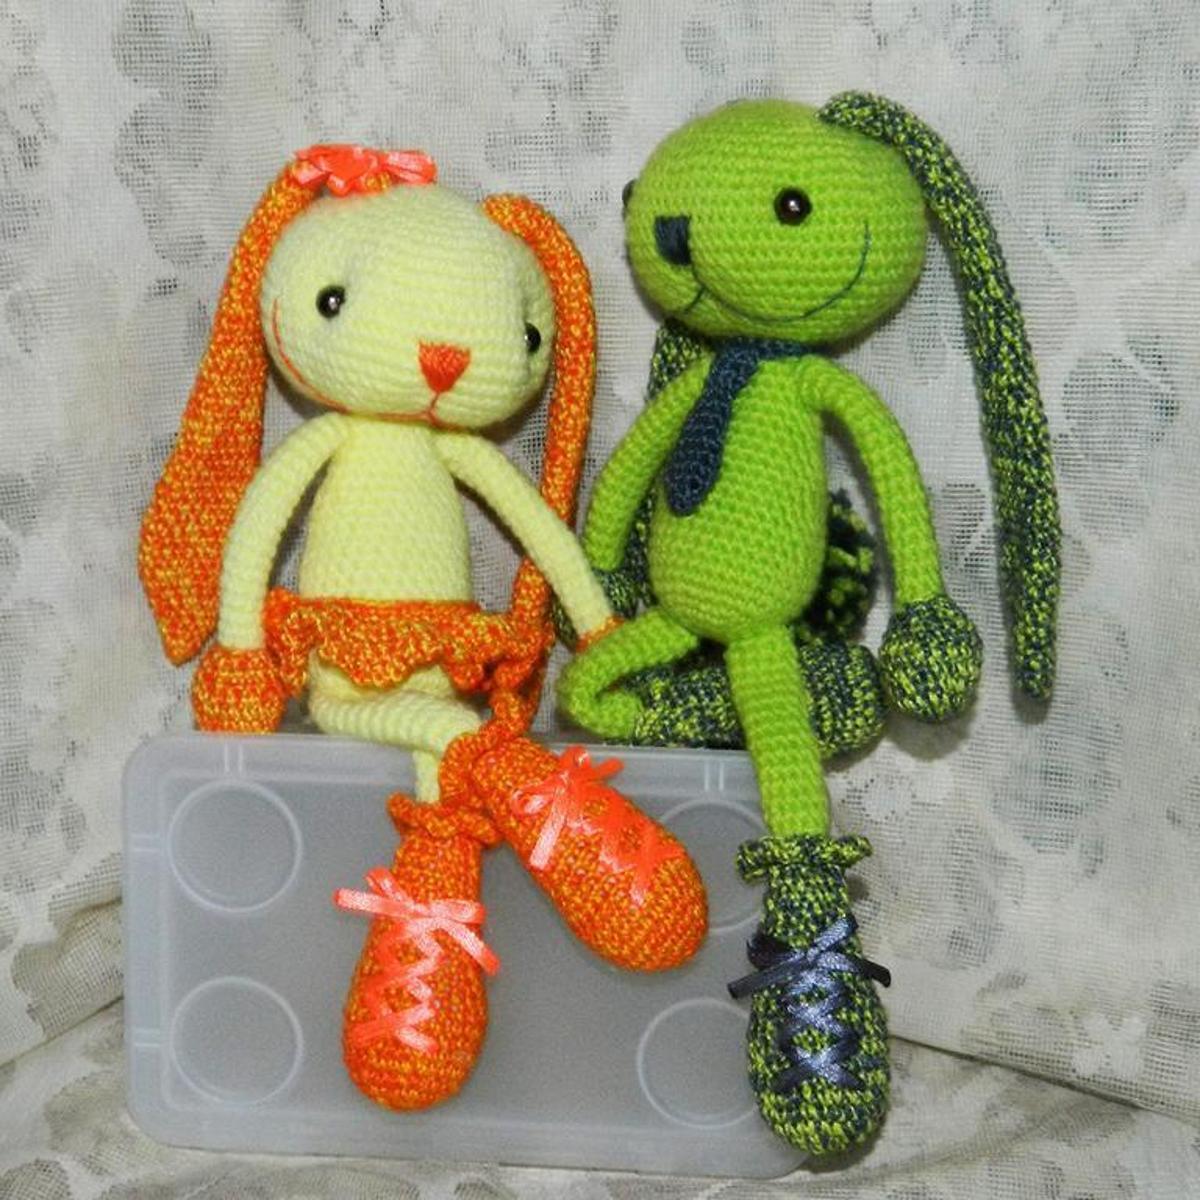 Sweet Amigurumi Hares Crochet Pattern